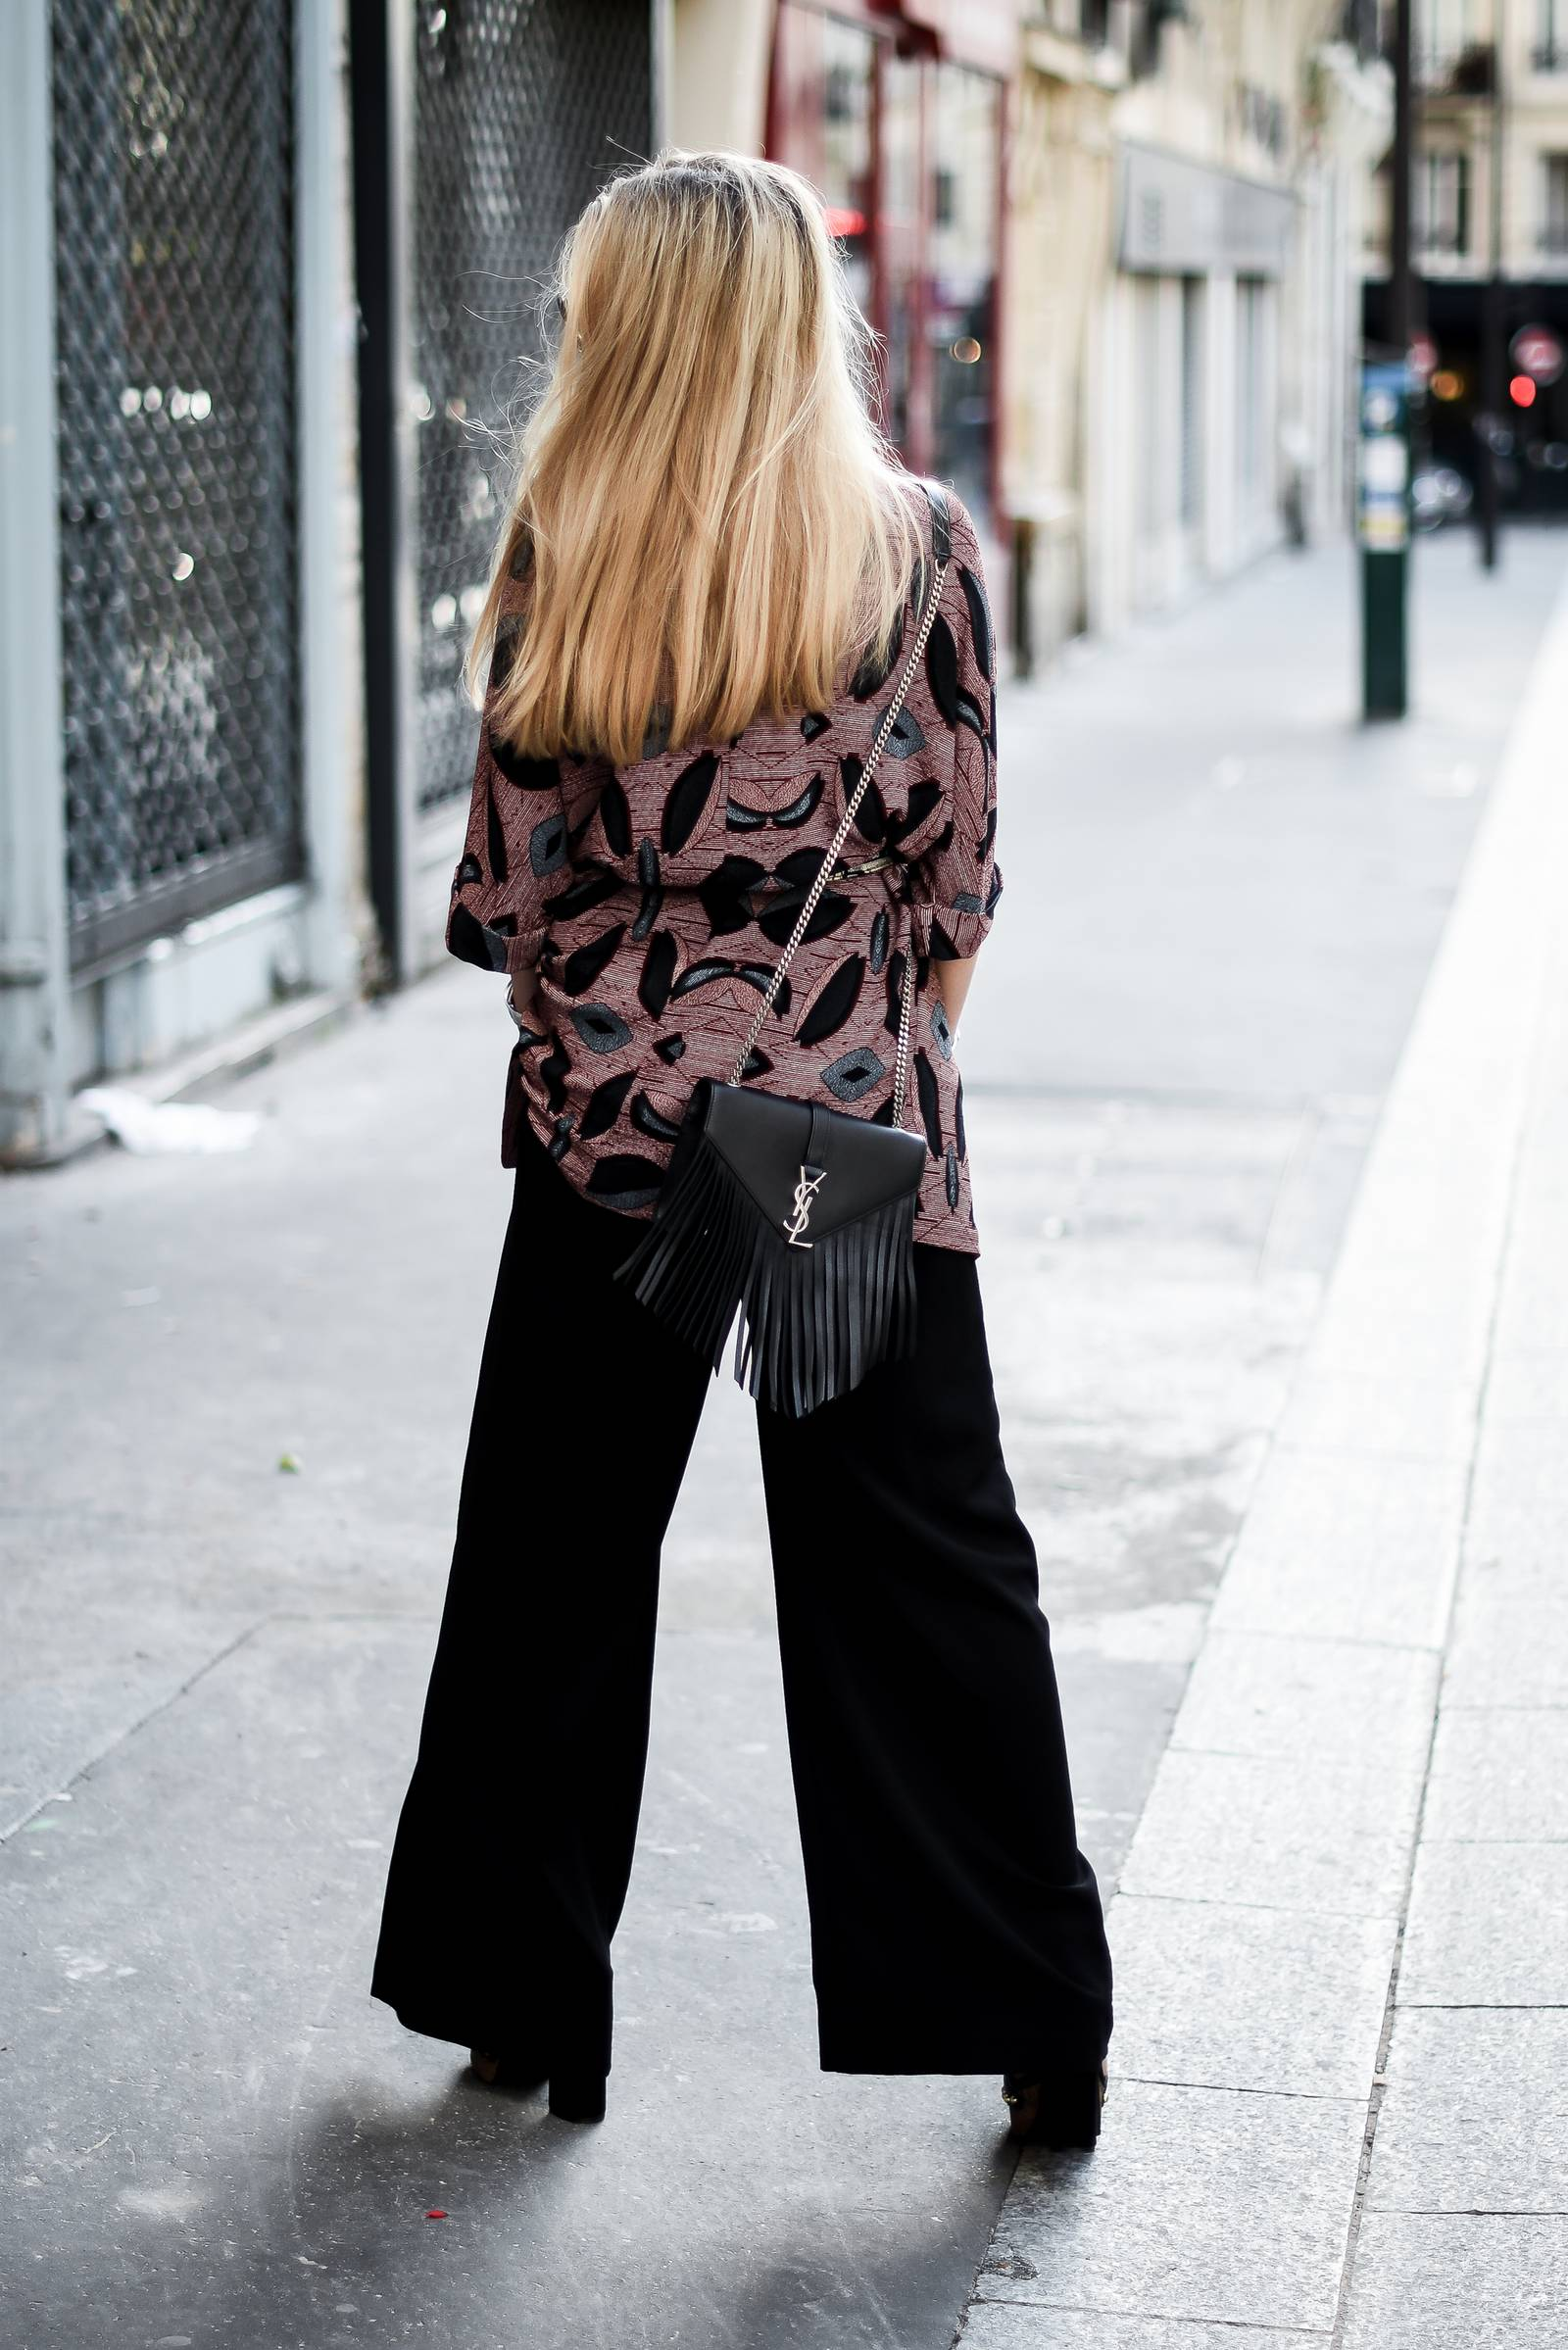 blog mode - Comment s'habiller pour aller au restaurant 3